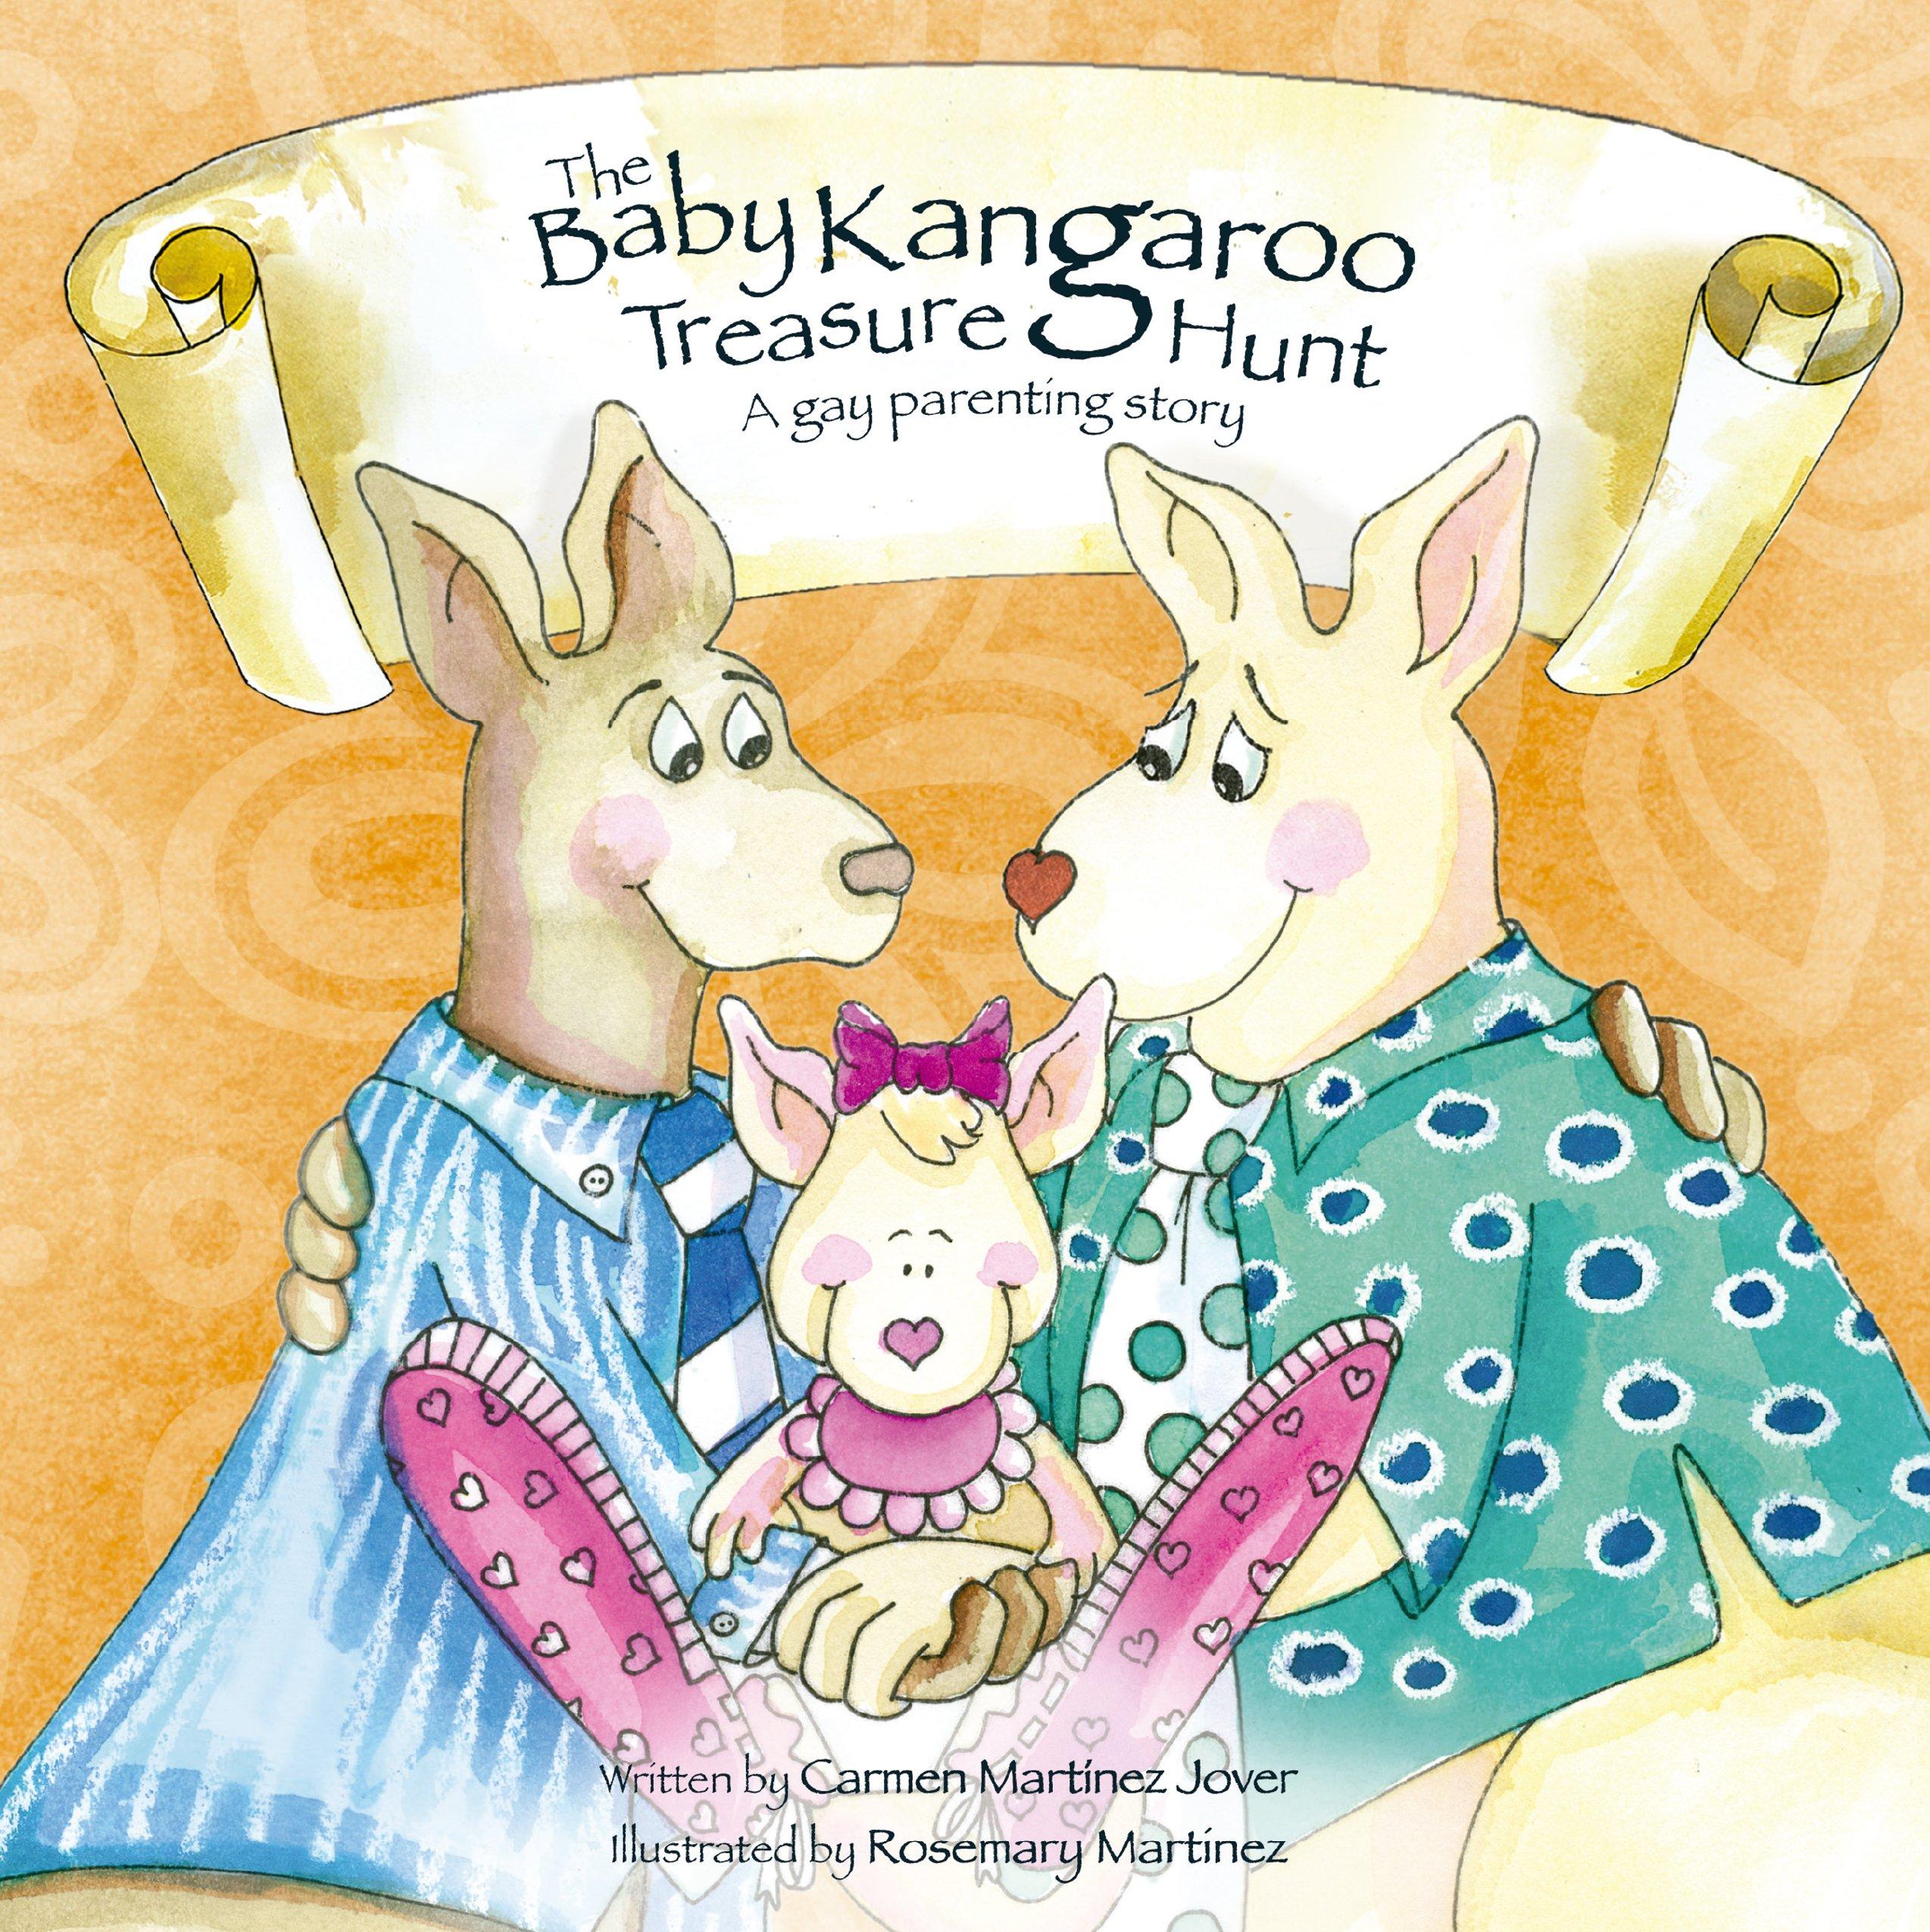 THE BABY KANGAROO TREASURE HUNT, a gay parenting story